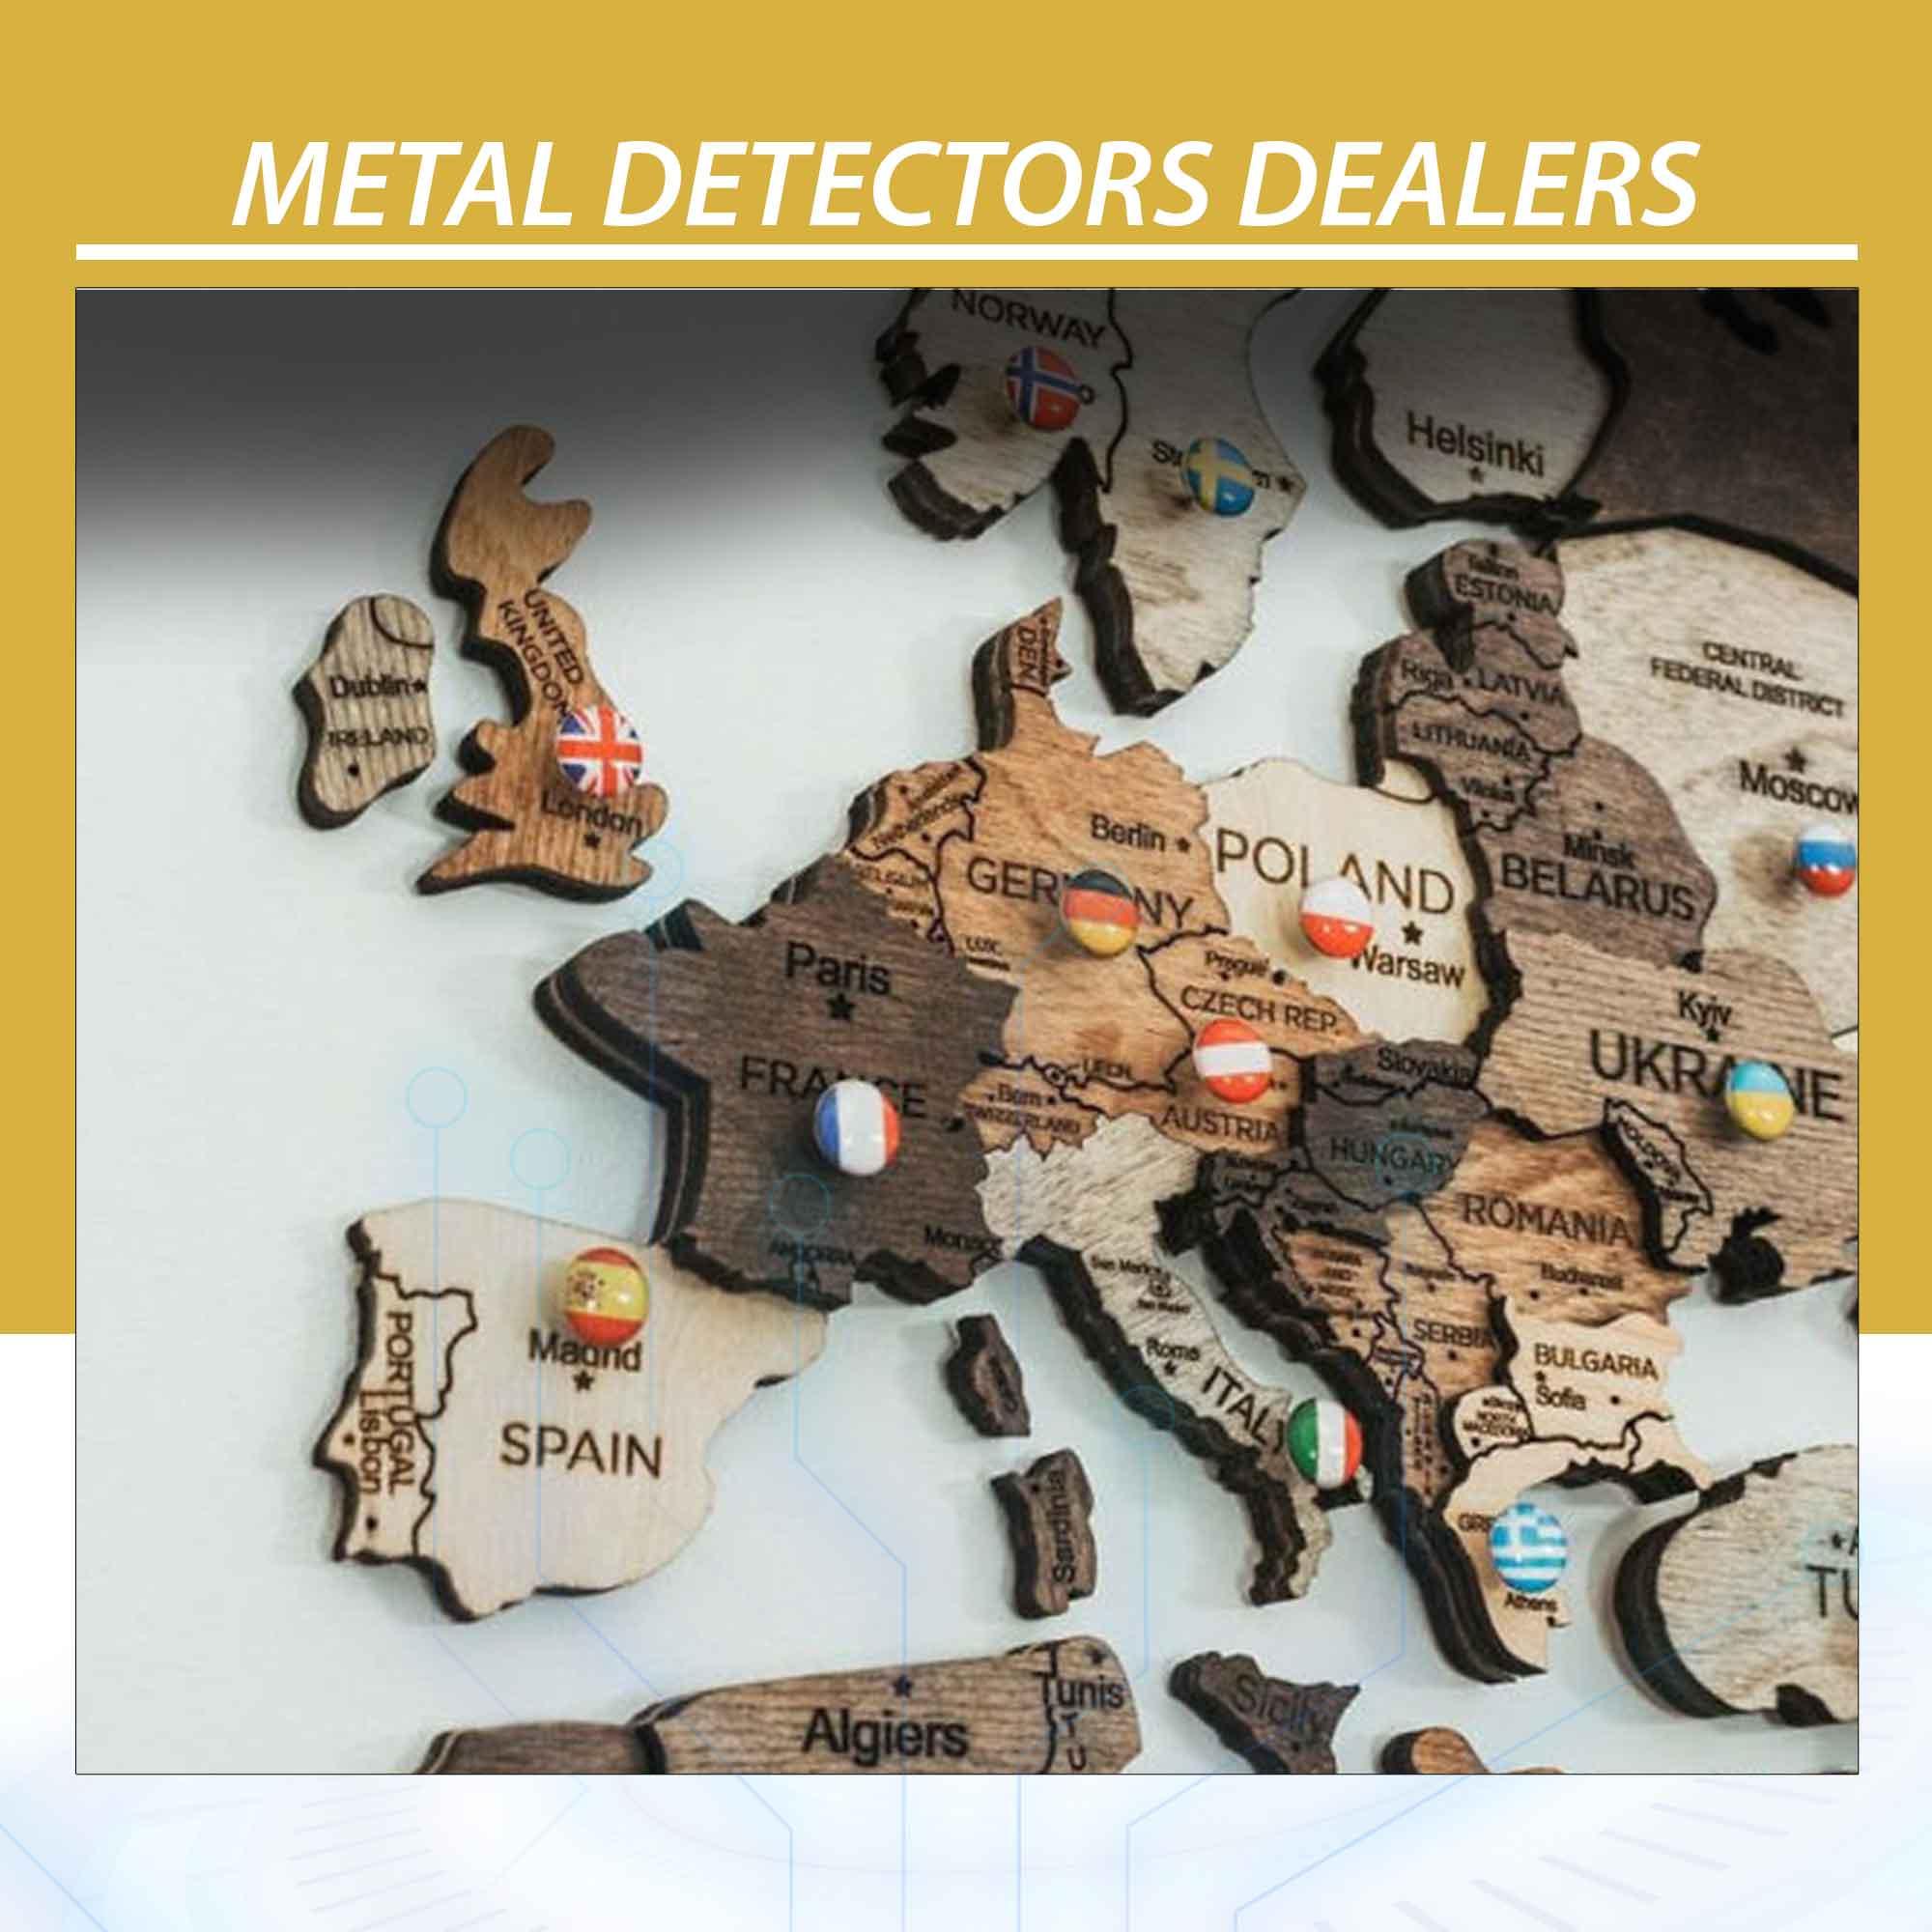 Metal Detectors Dealers